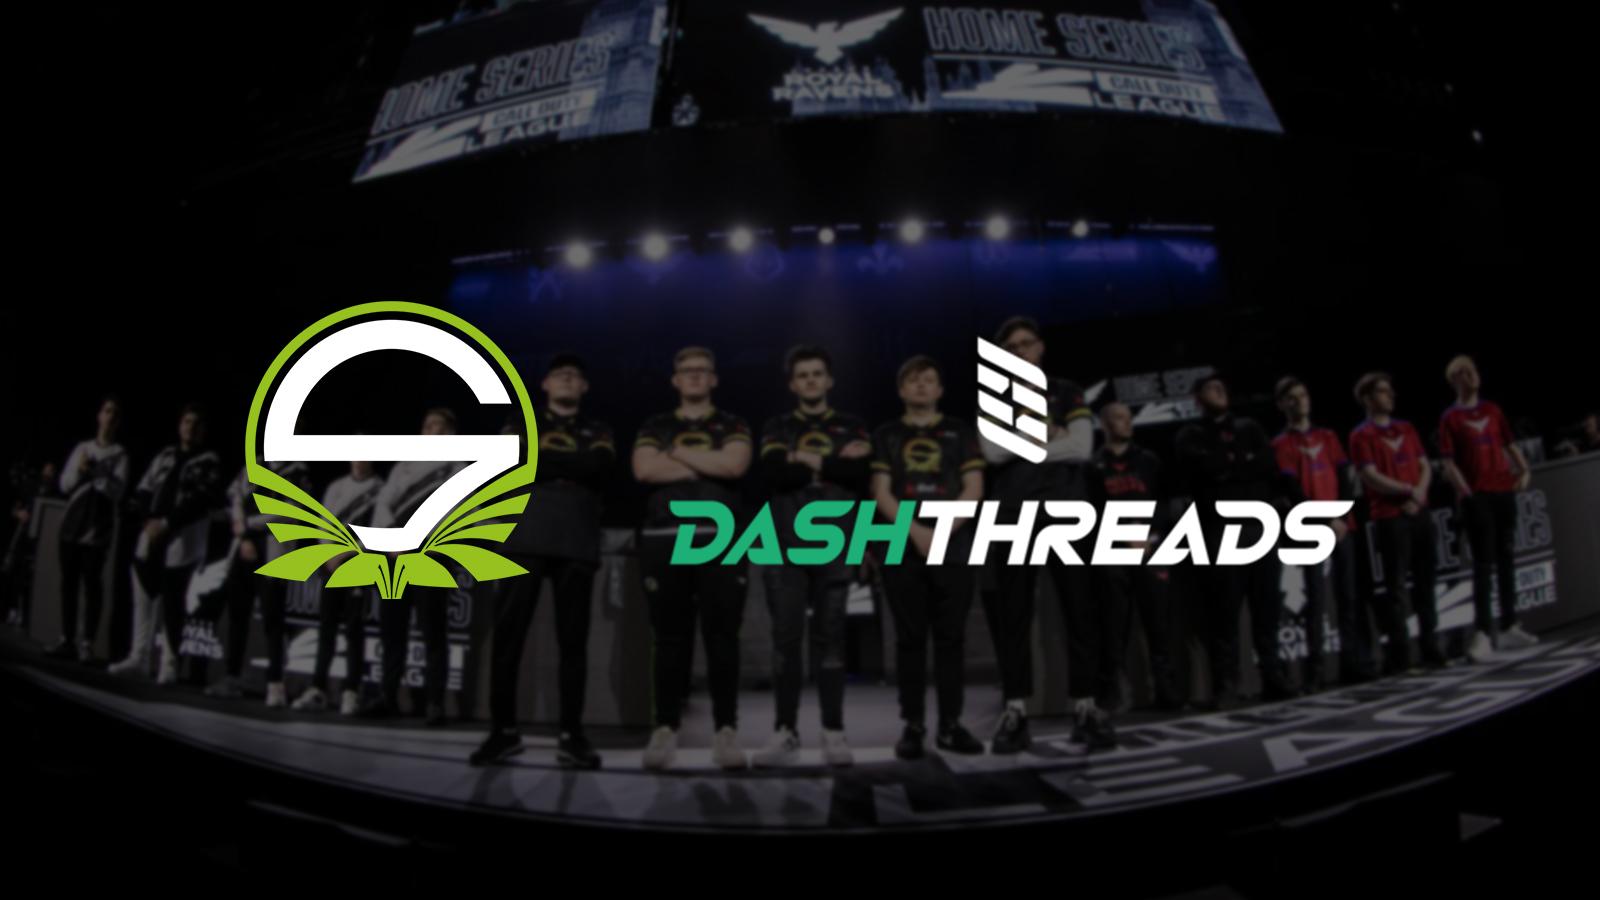 Team Singularity DashThreads Termination